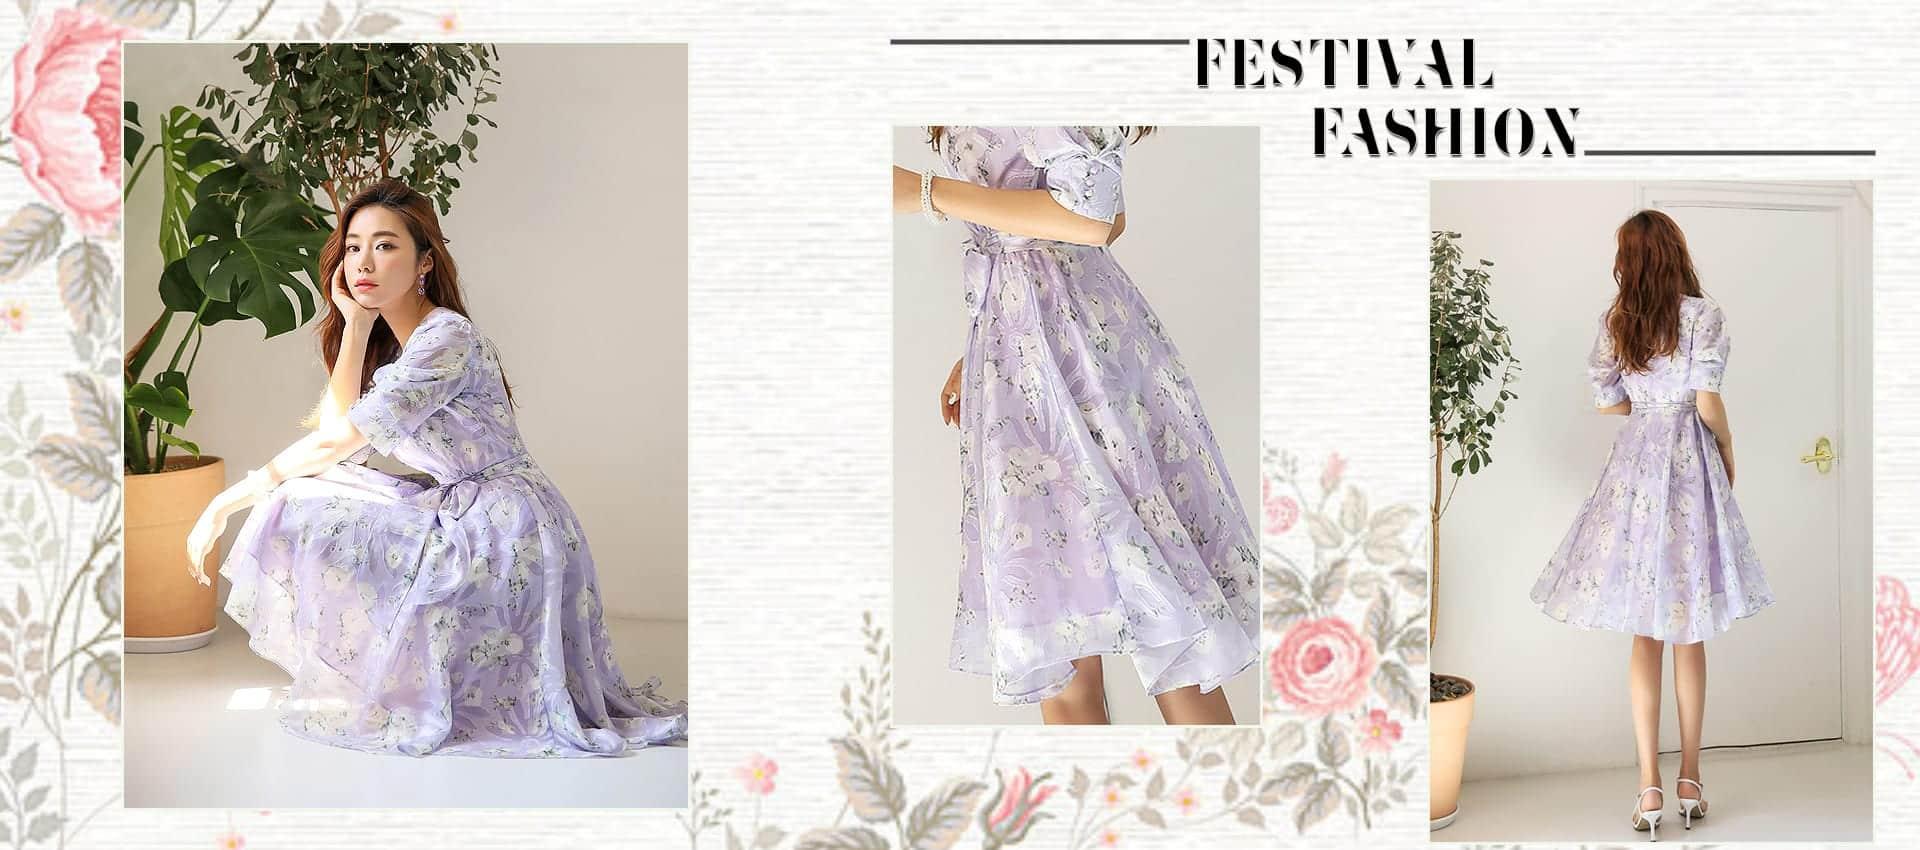 Banner Festival Fashion - Thời trang thiết kế cao cấp